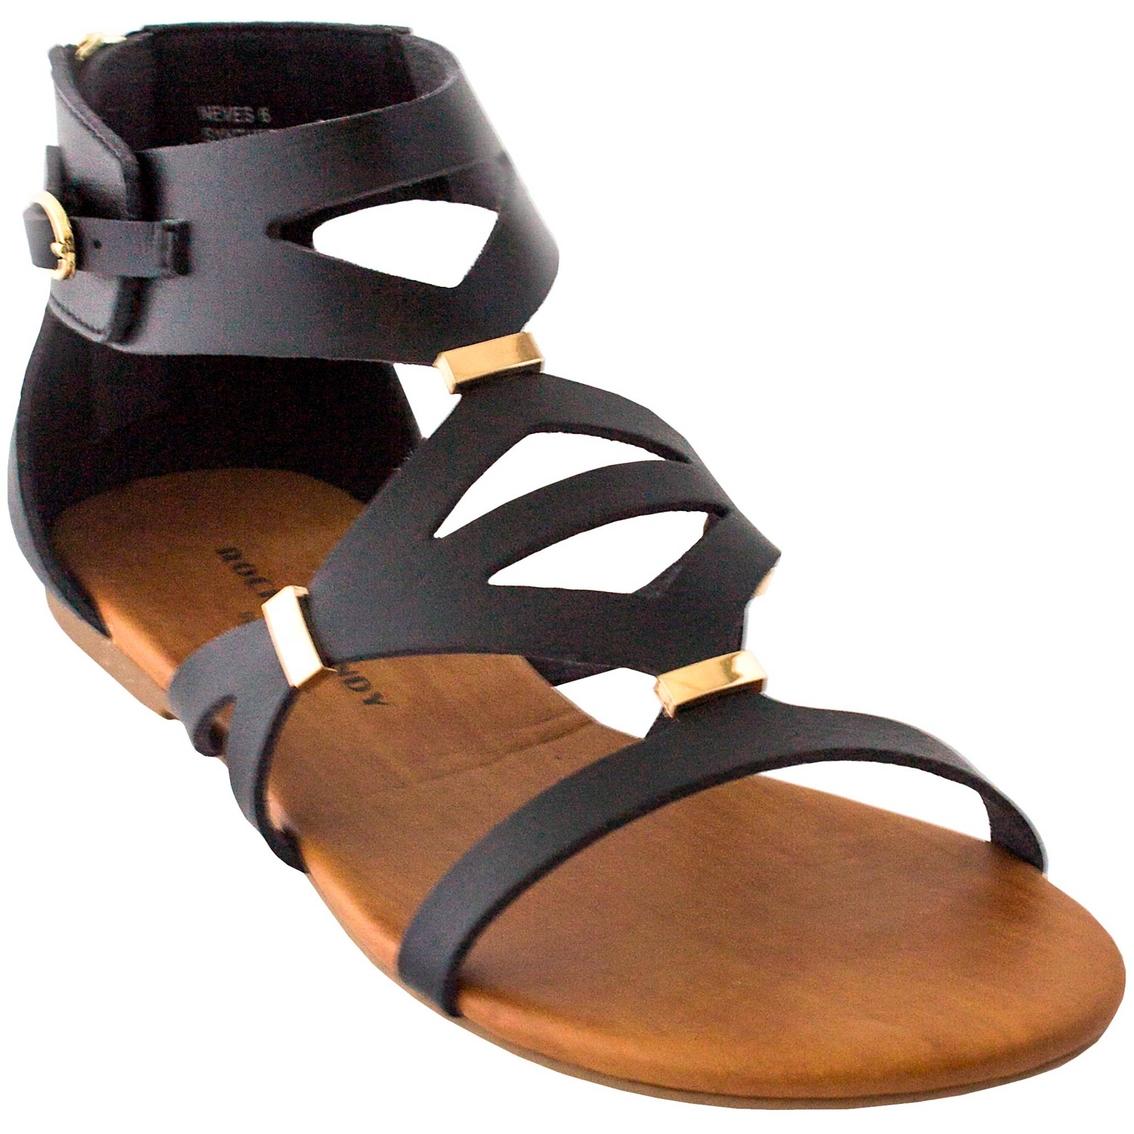 aa27de1b80a2 Rock   Candy Neves Back Zip Flat Gladiator Sandals